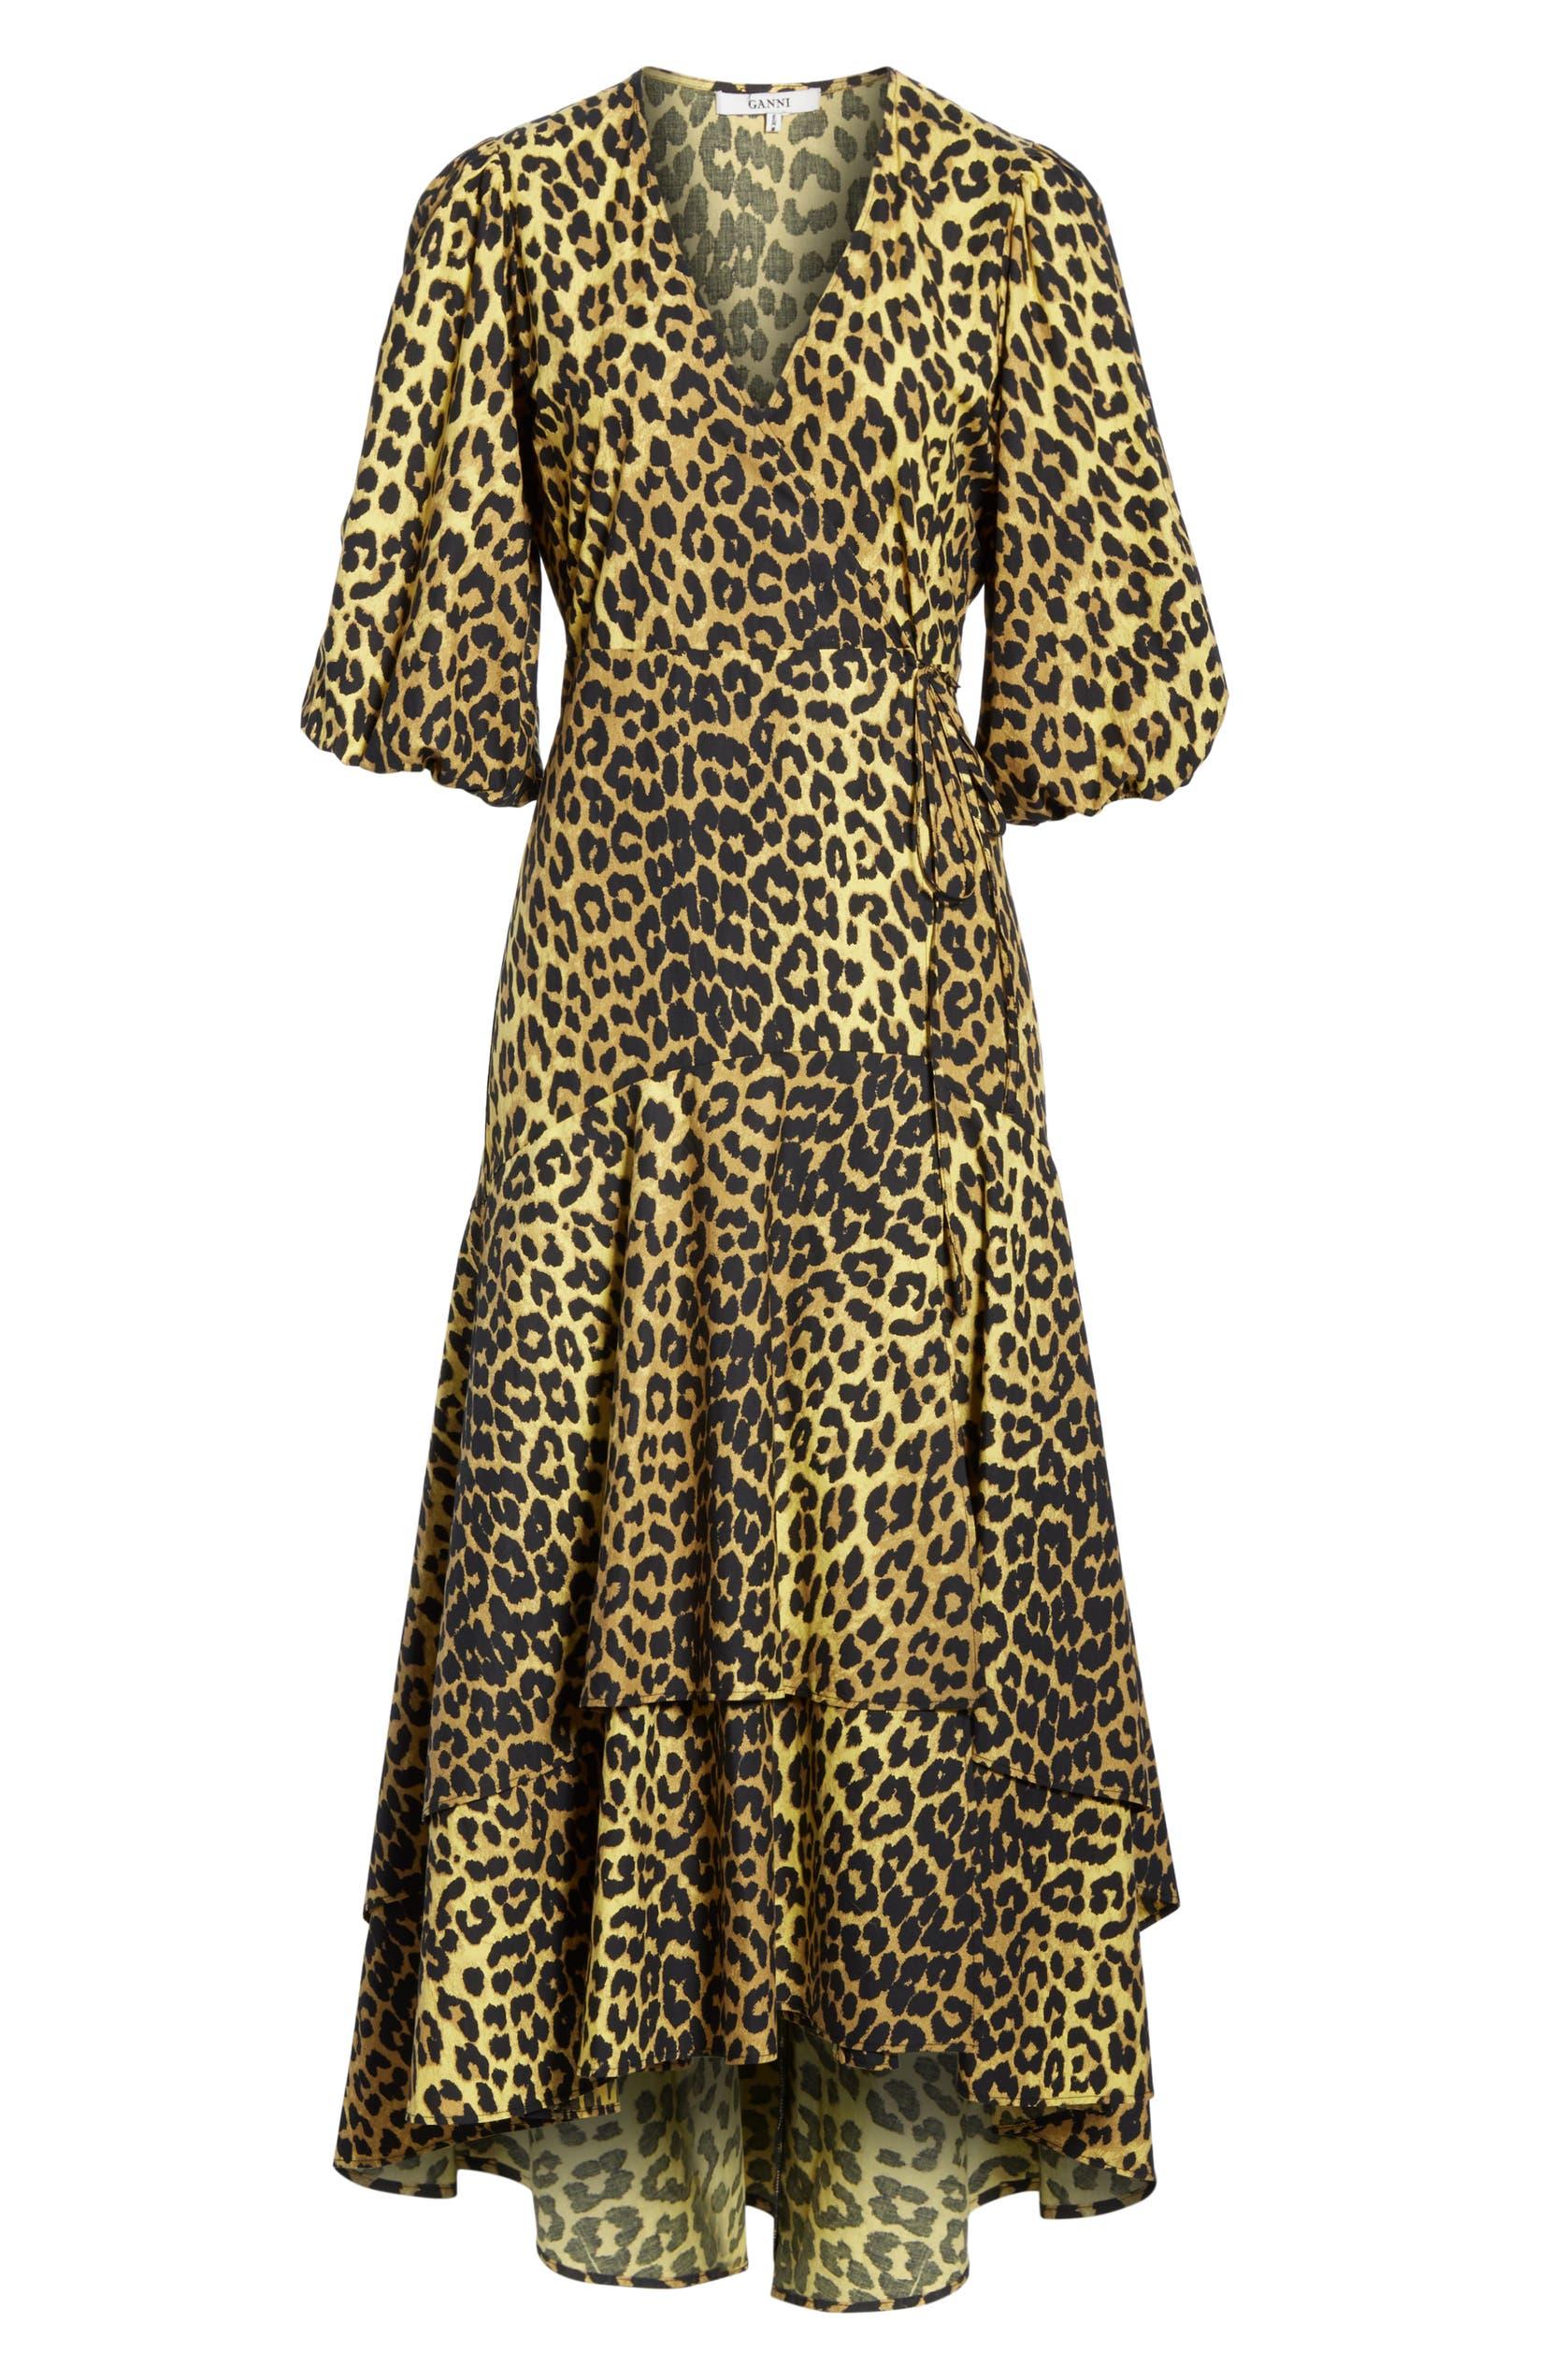 879dd838208 Ganni Leopard Print Cotton Wrap Dress | Nordstrom